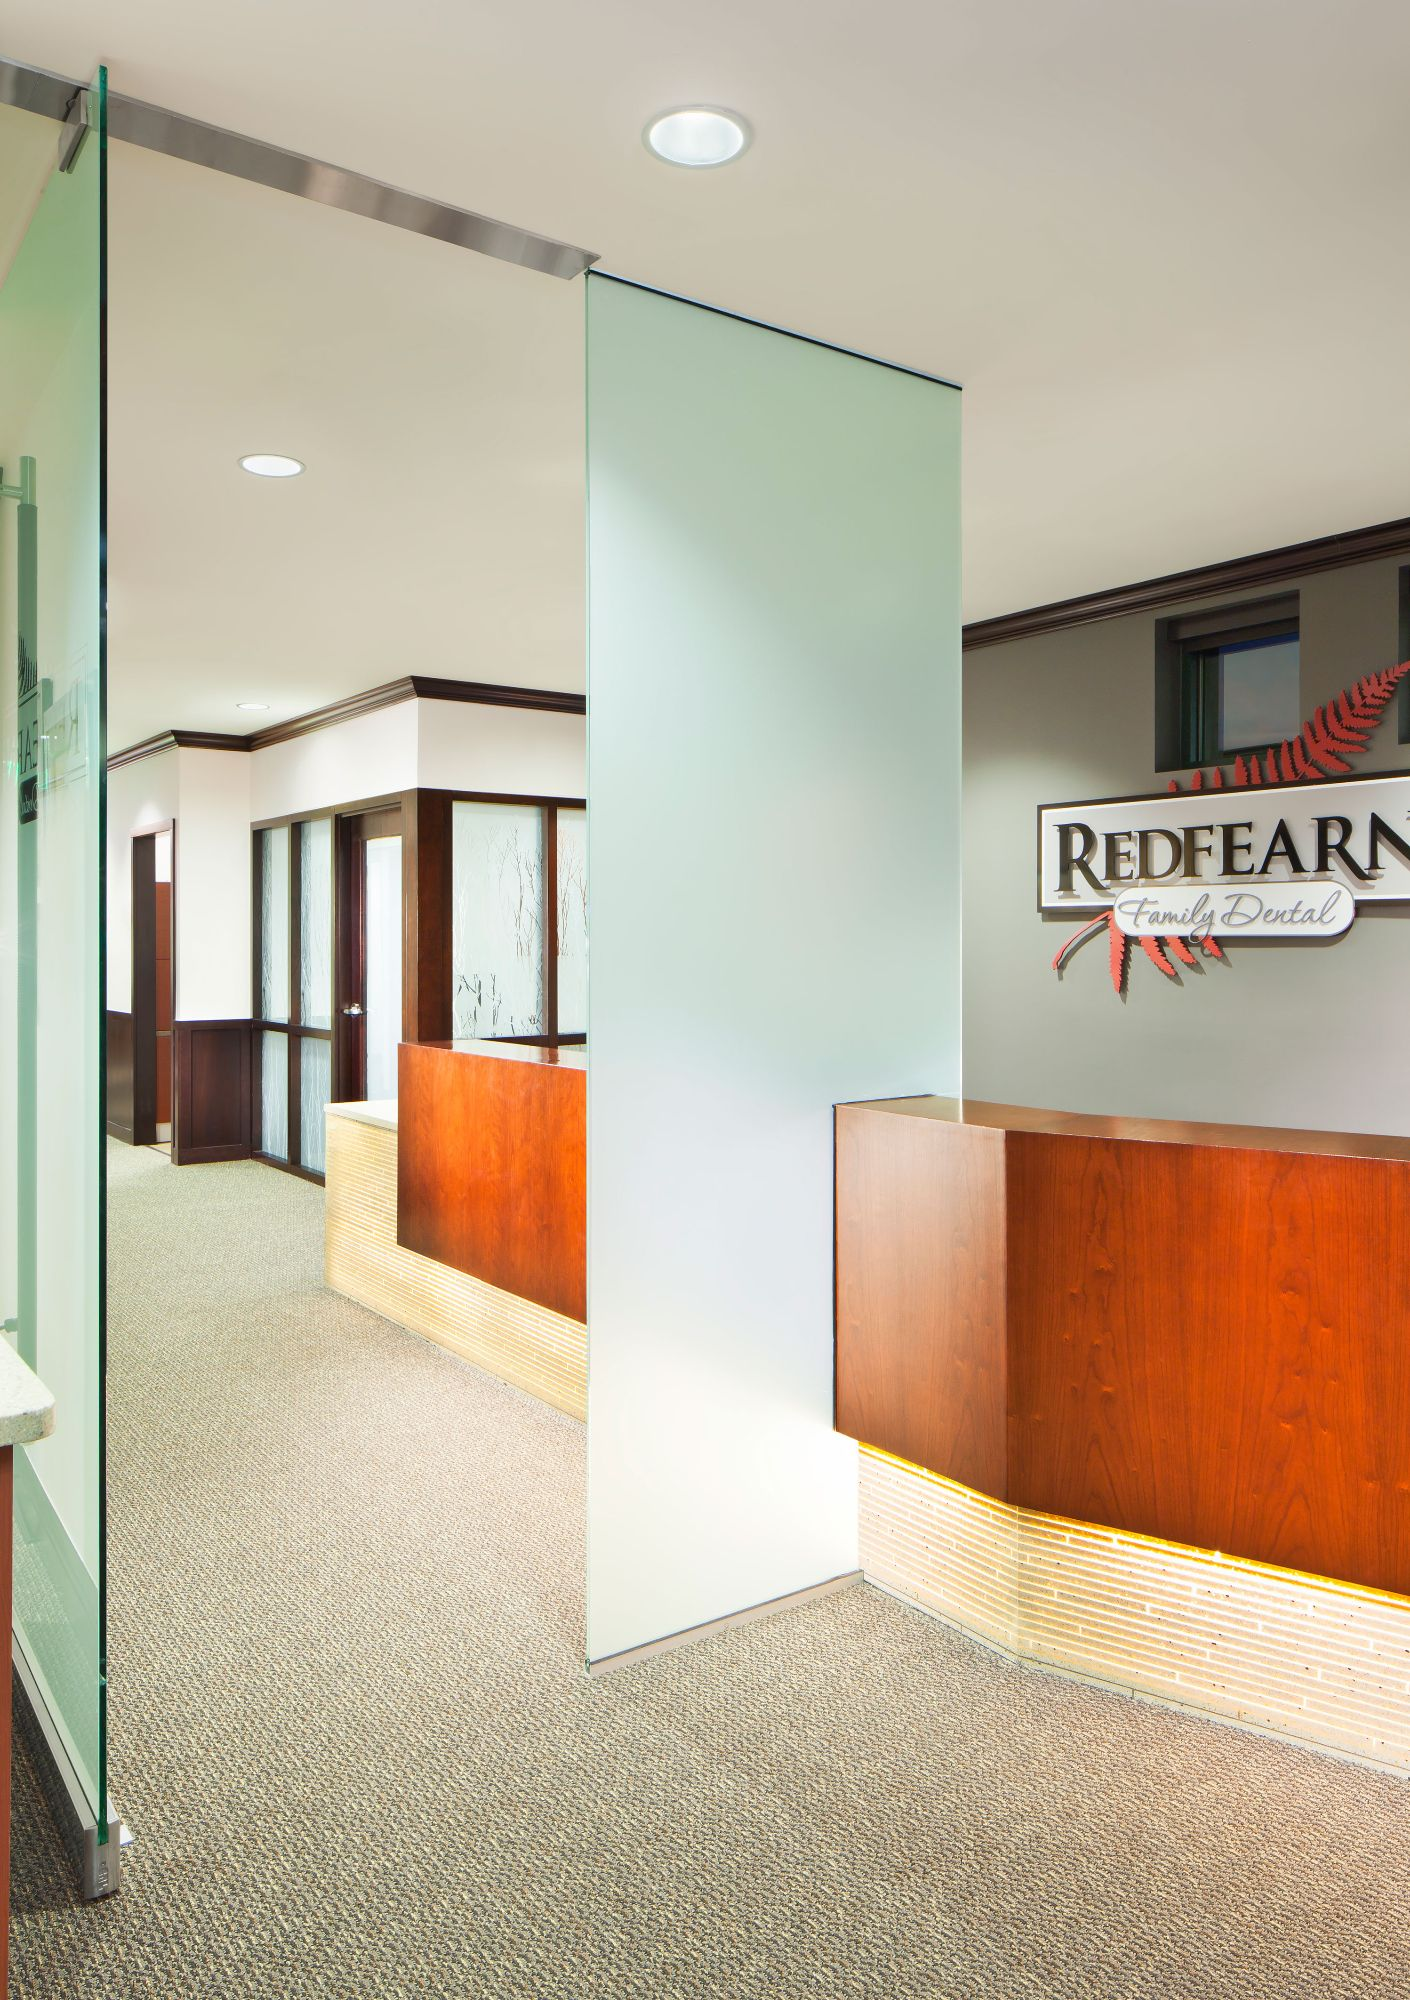 Redfearn Dental Reception